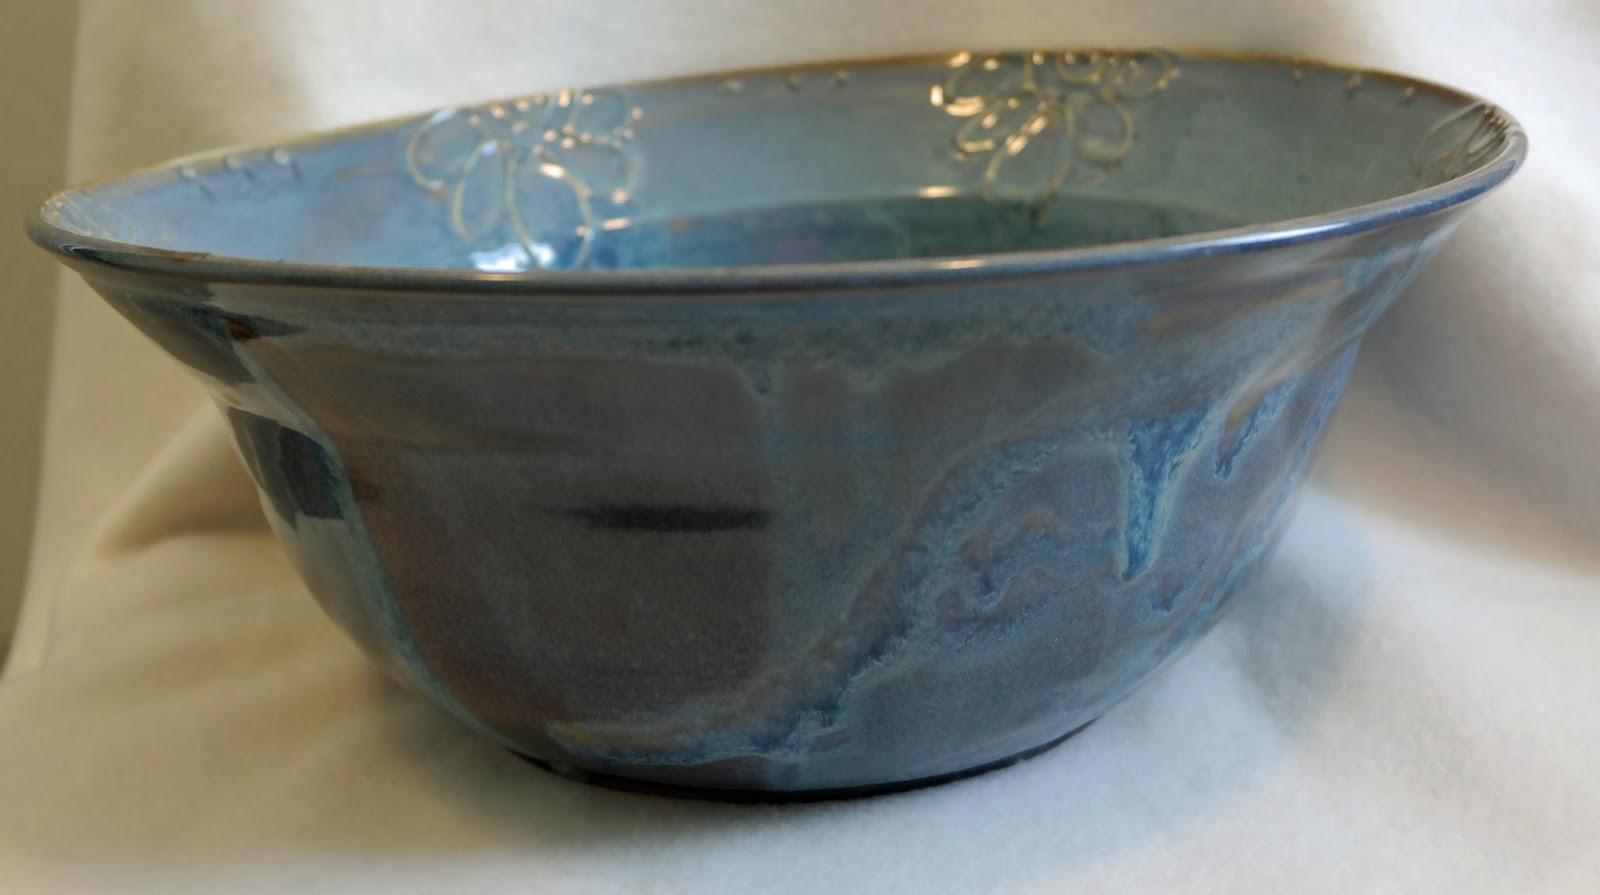 Excellent Backyard Mudslingers Pottery Studio: Pottery SA93